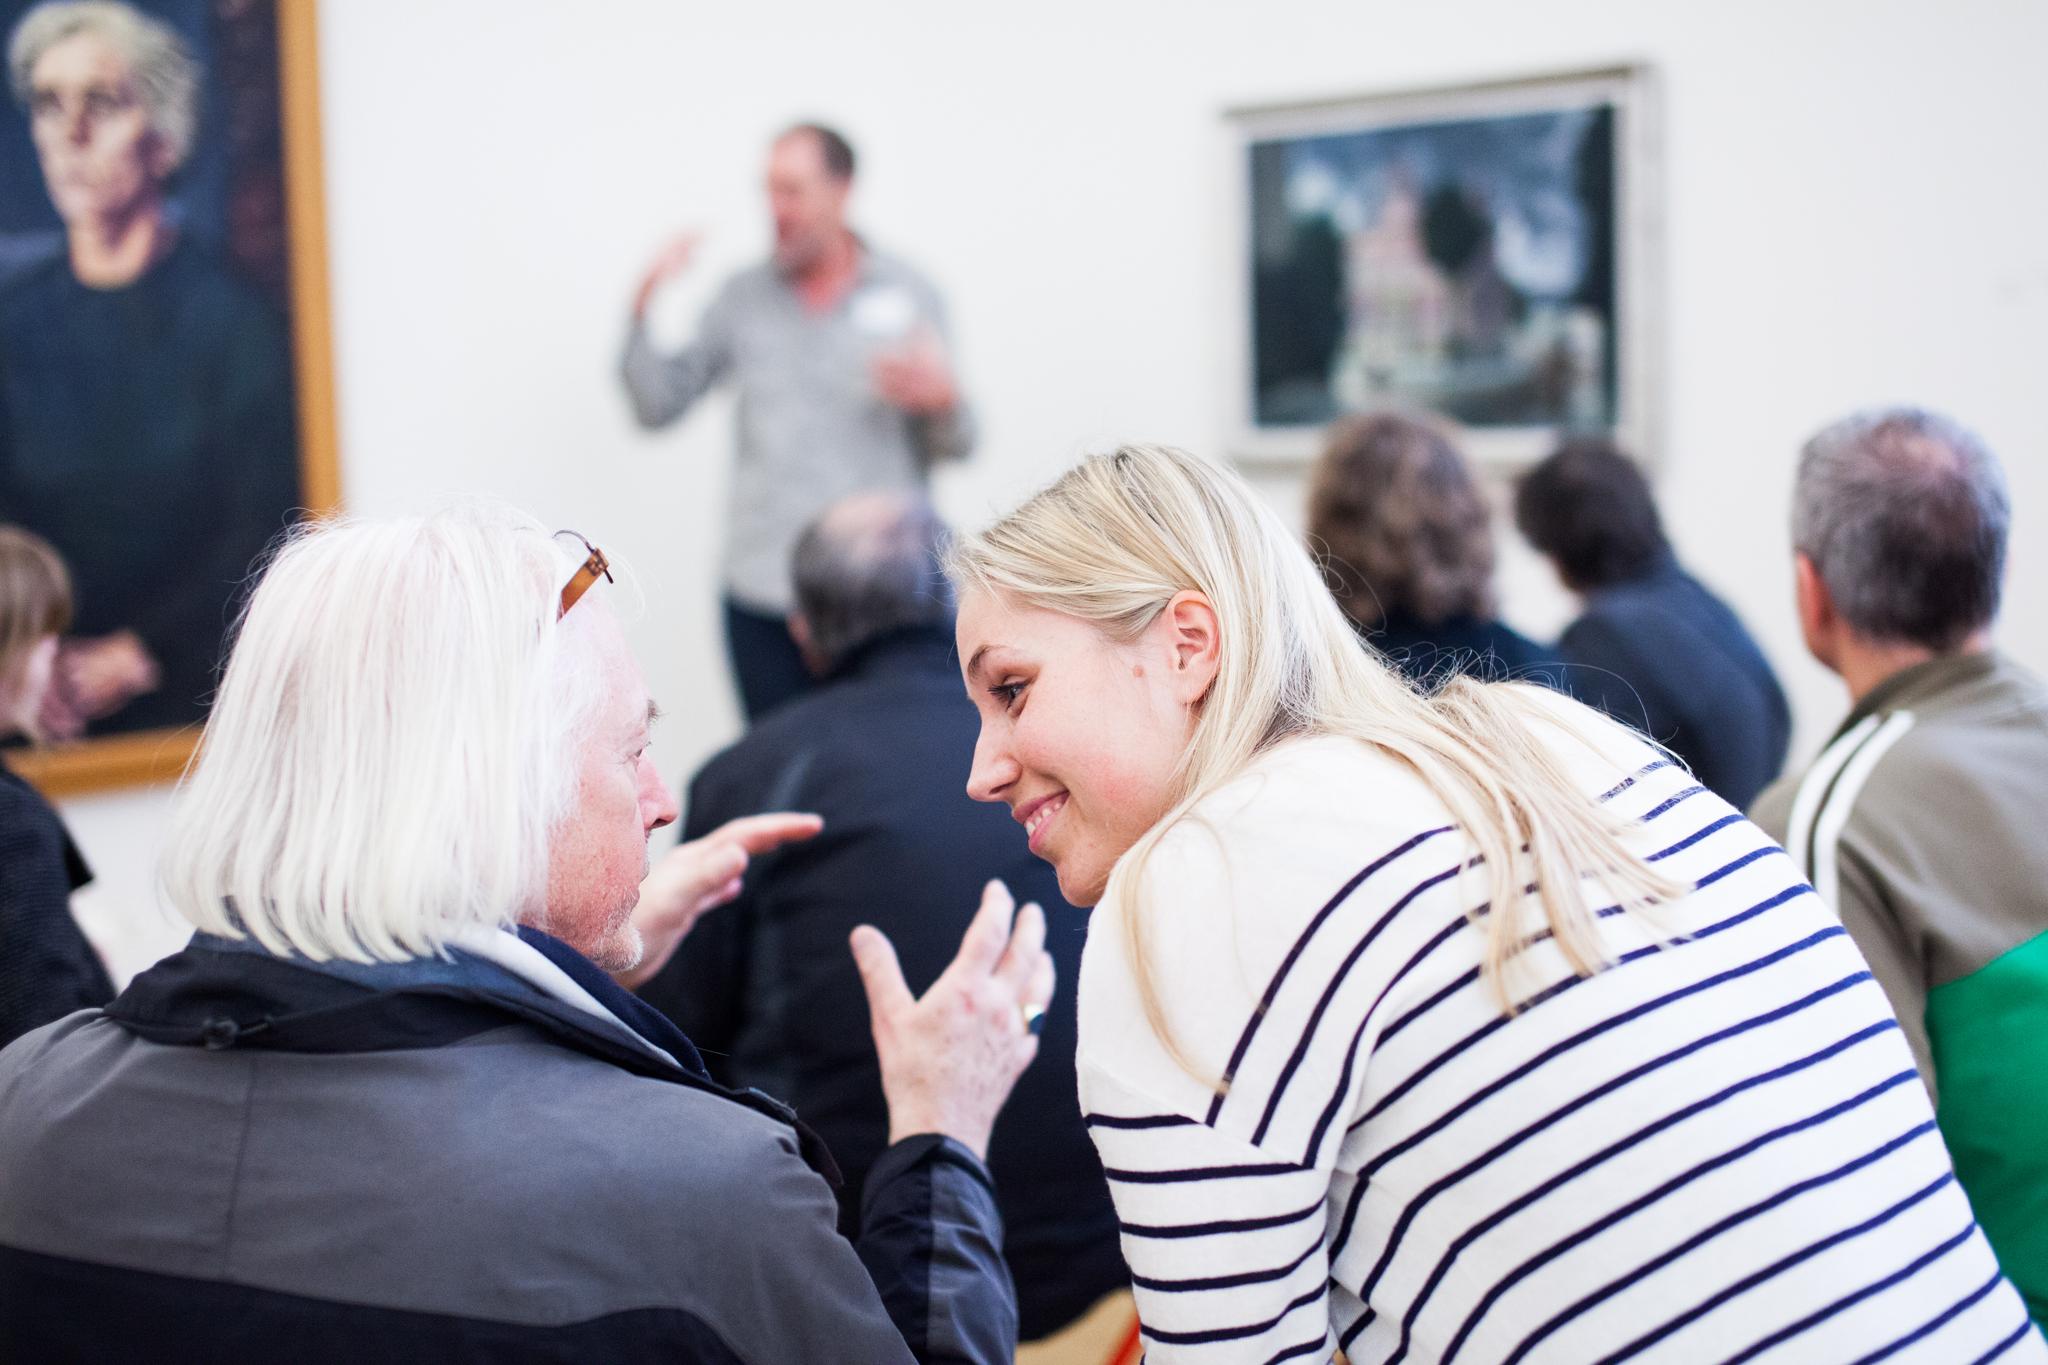 Foto: Stedelijk Museum / Stefanie Metsemakers